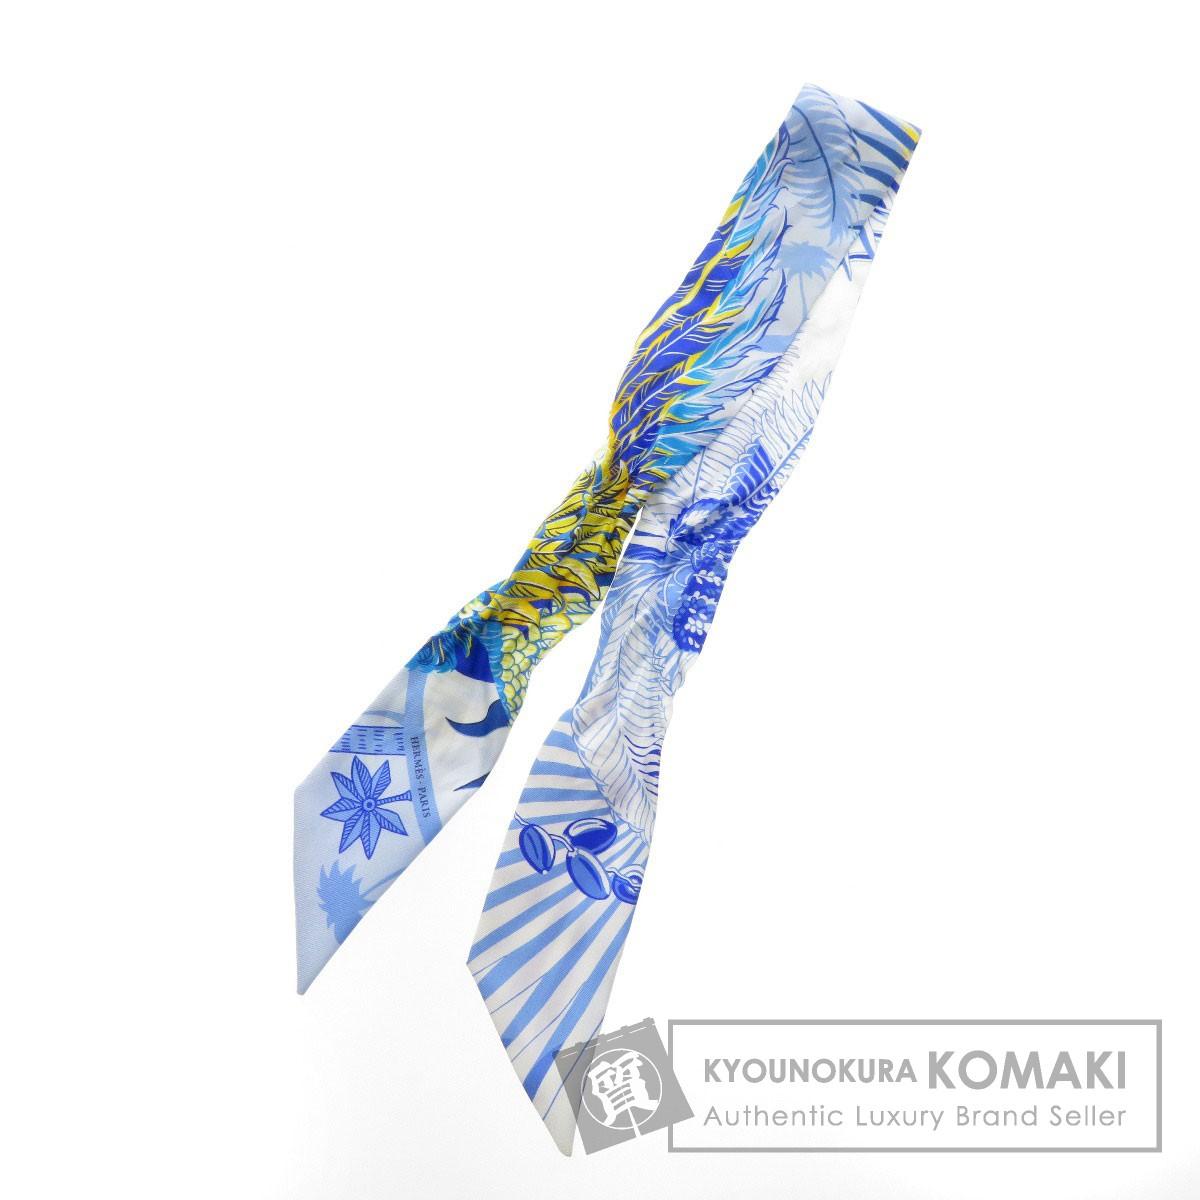 HERMES ツイリー スカーフ シルク レディース 【中古】【エルメス】